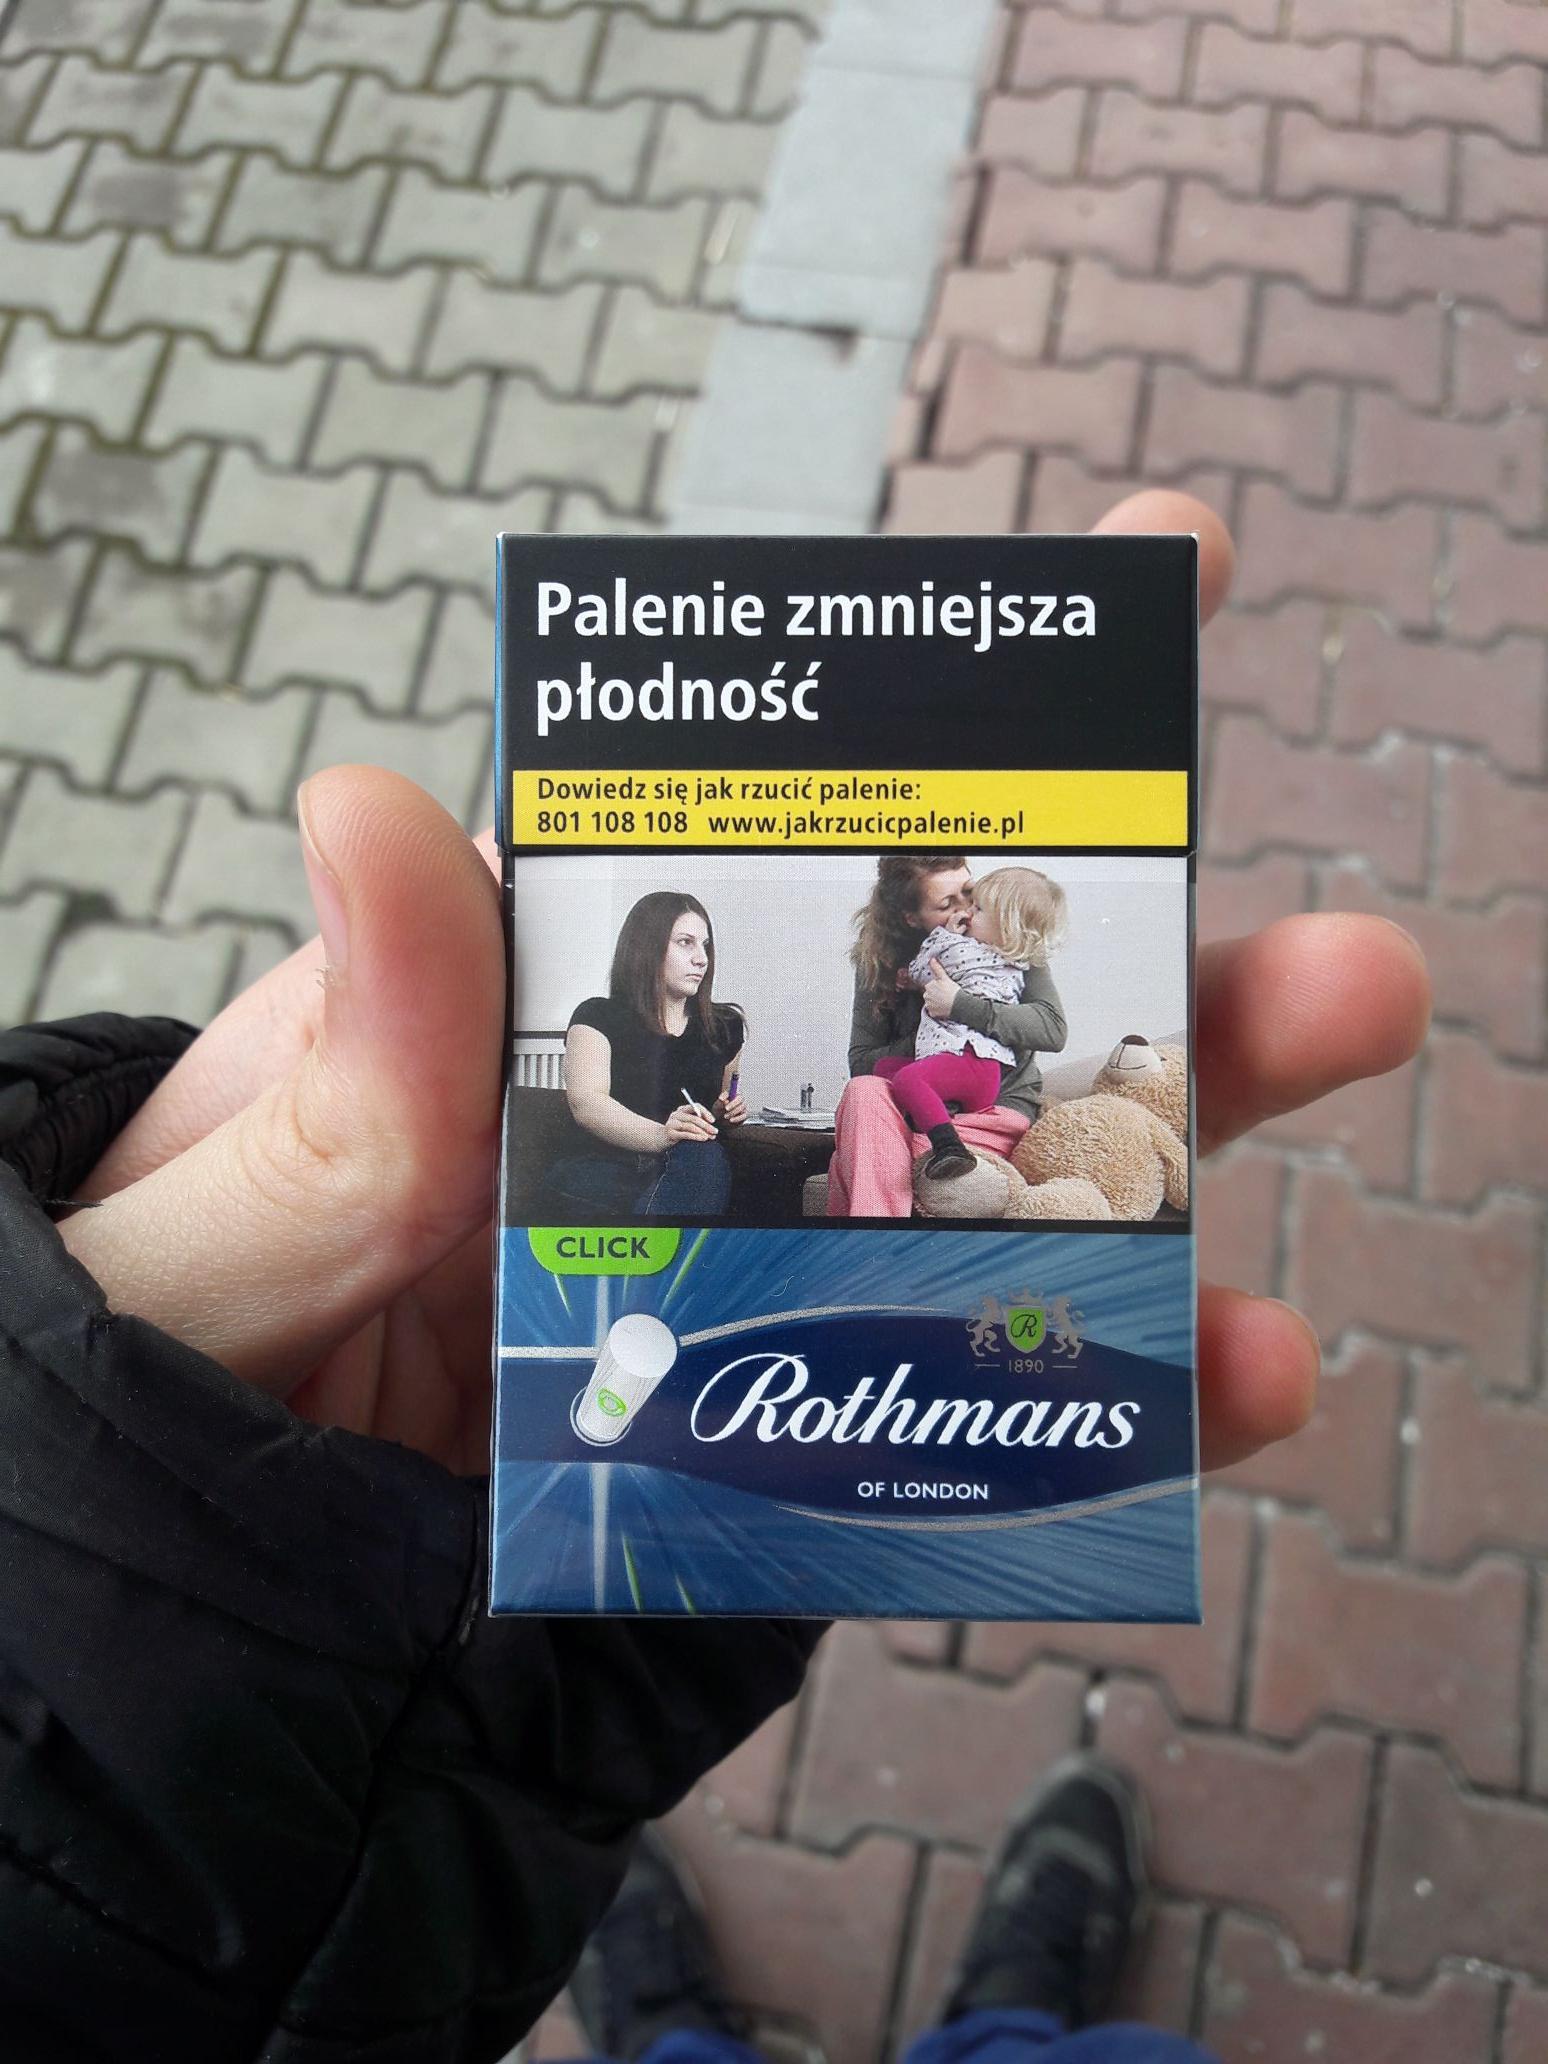 Fresh Market do fajek Rothmans click rabat 3 ziko na kolejne zakupy